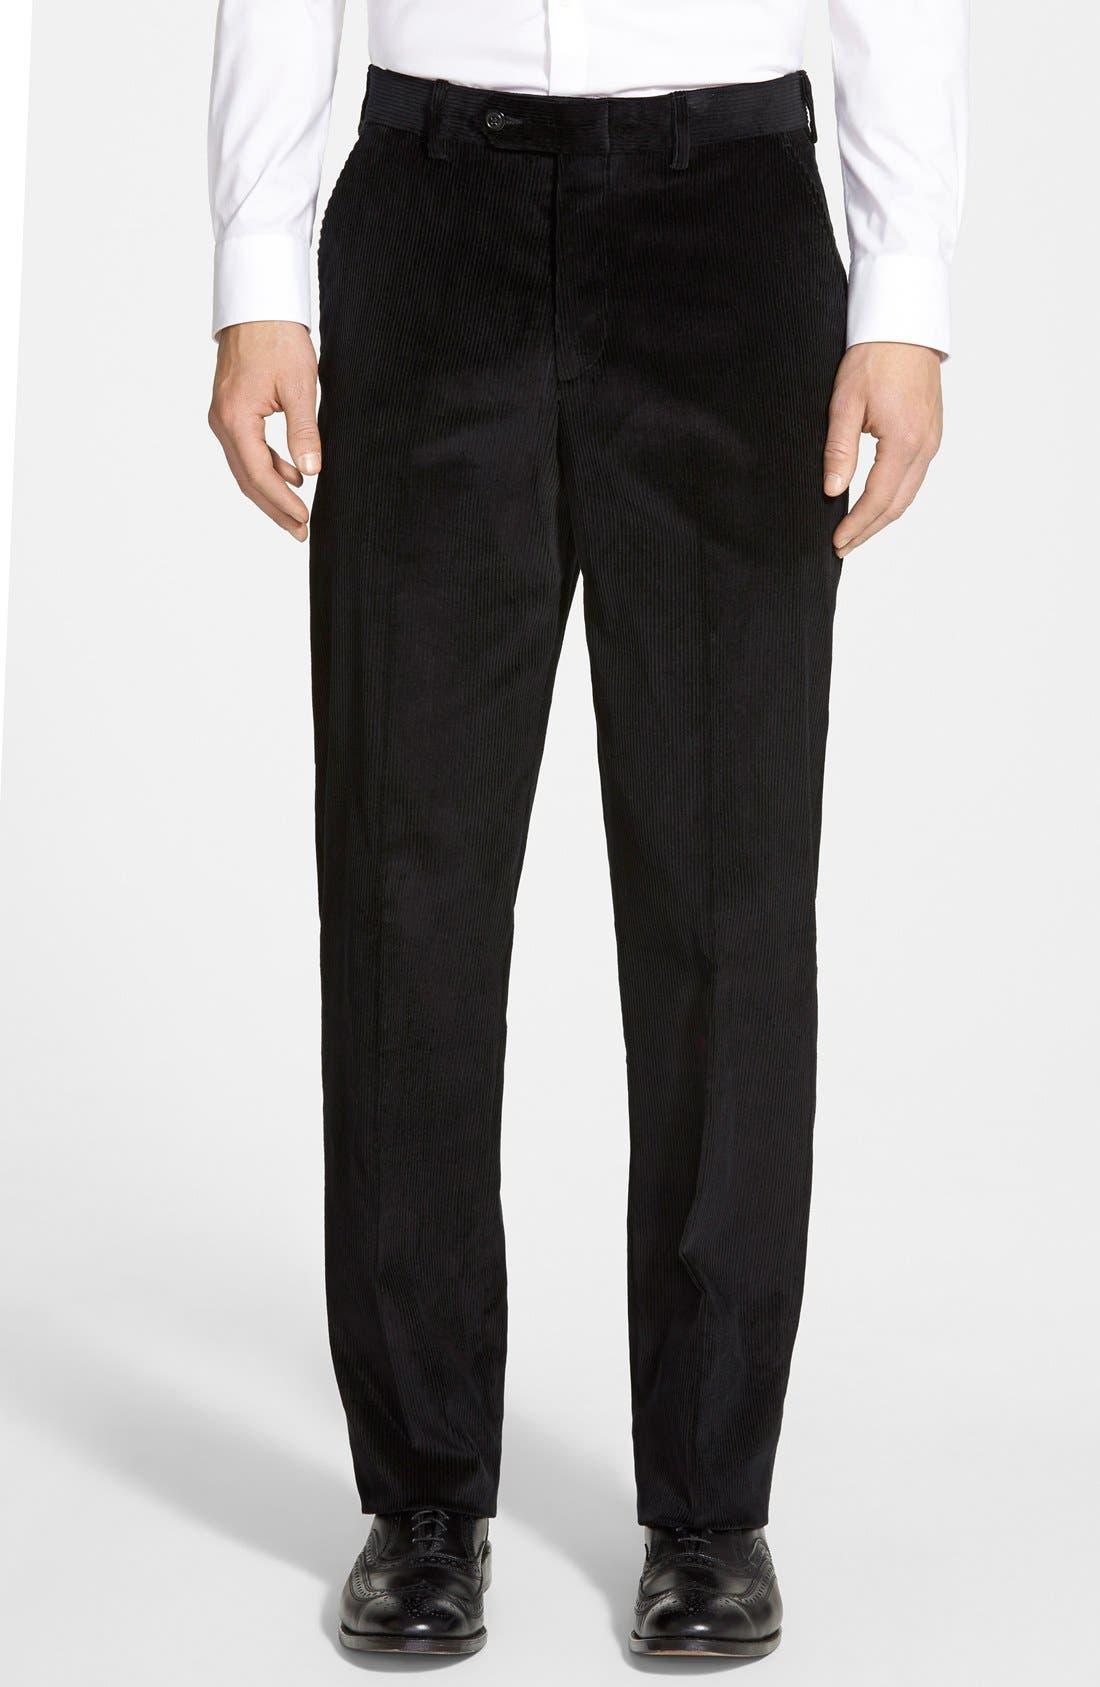 Flat Front Corduroy Trousers,                             Main thumbnail 1, color,                             Black